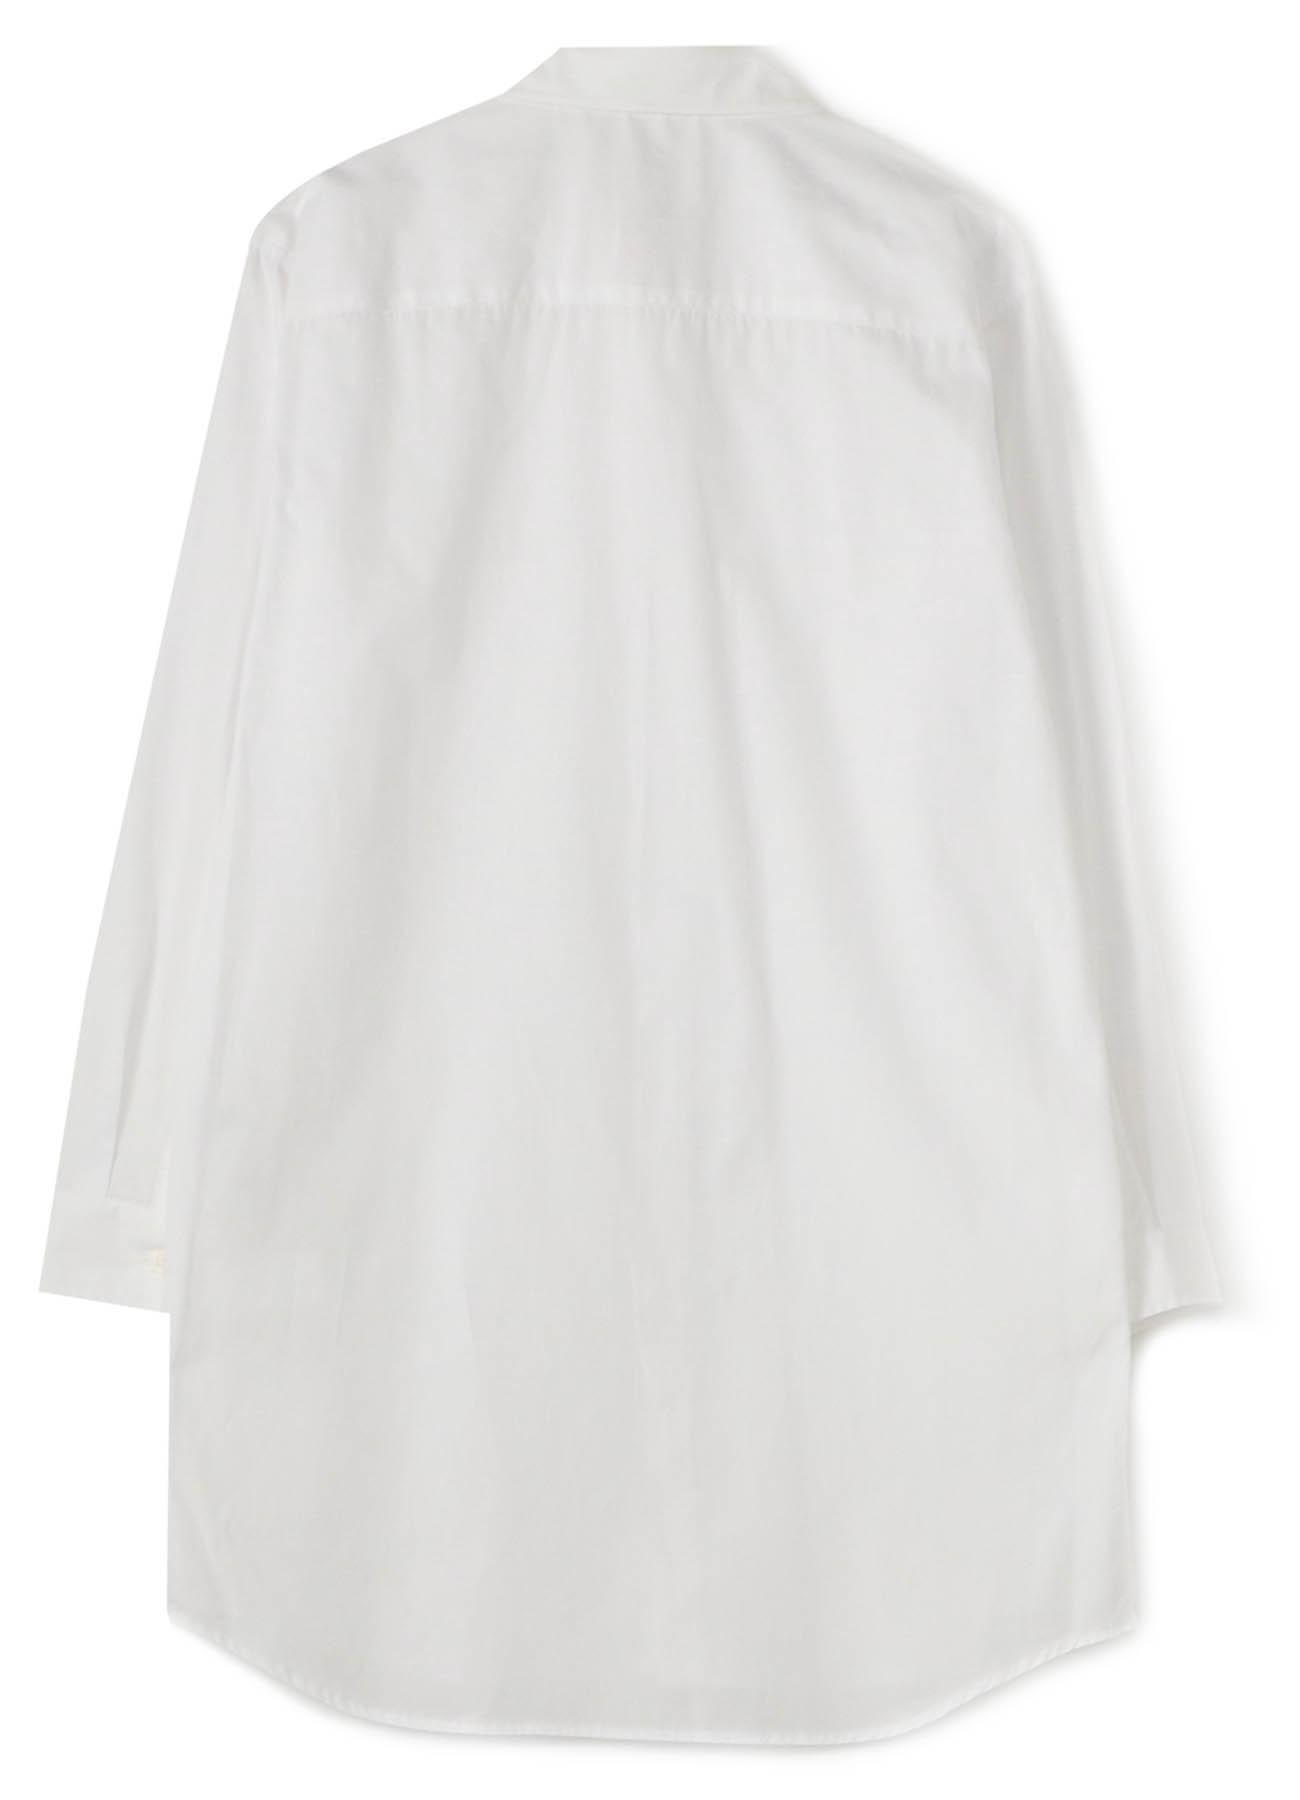 Cotton Broad Left Collar Gusset Shirt